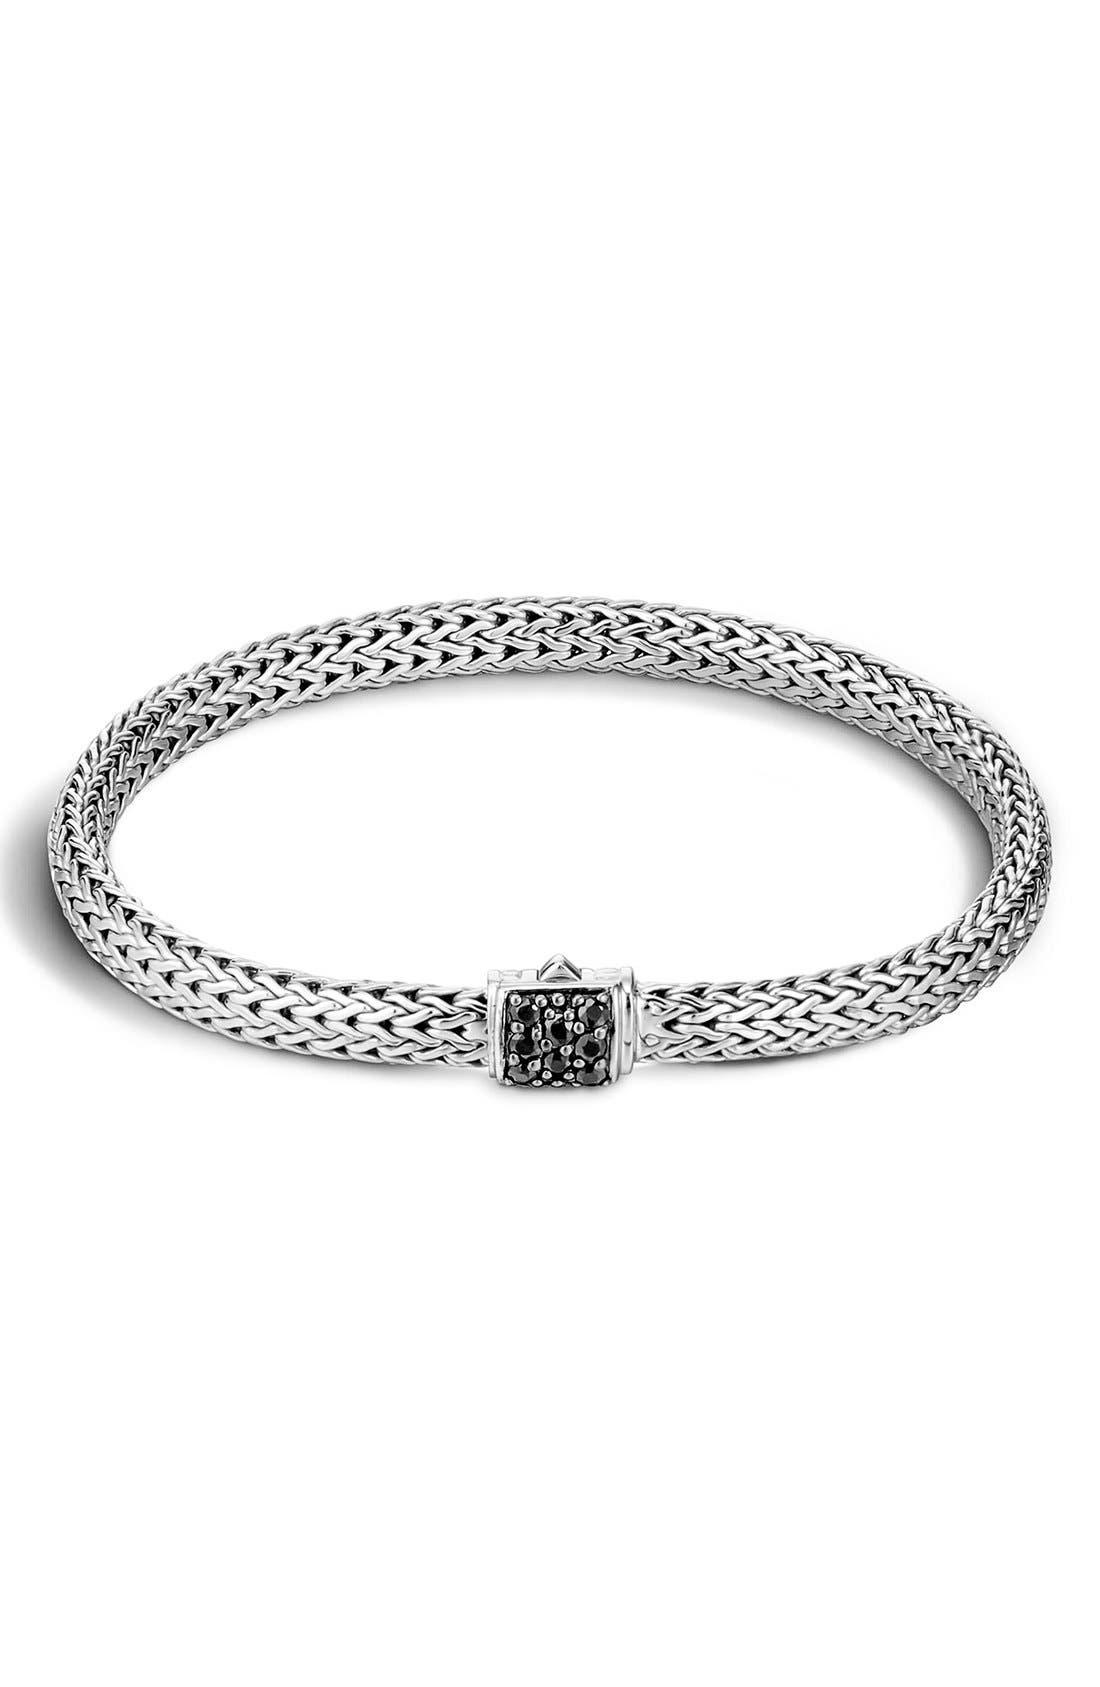 Main Image - John Hardy Classic Chain 5mm Bracelet